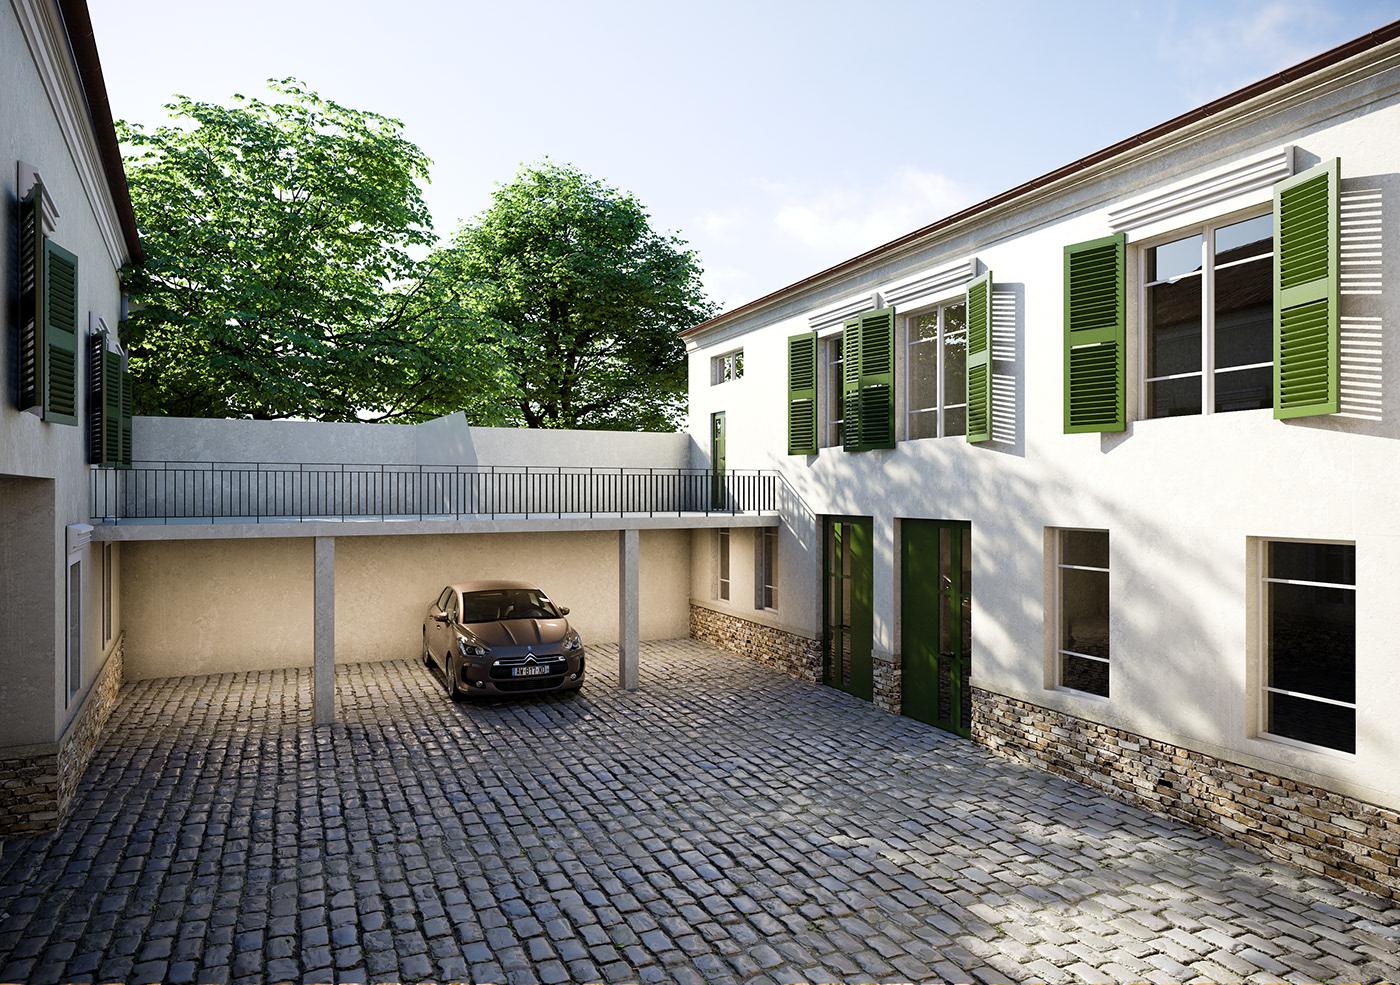 exterior design ideas france Paris traditional Renderings architecture